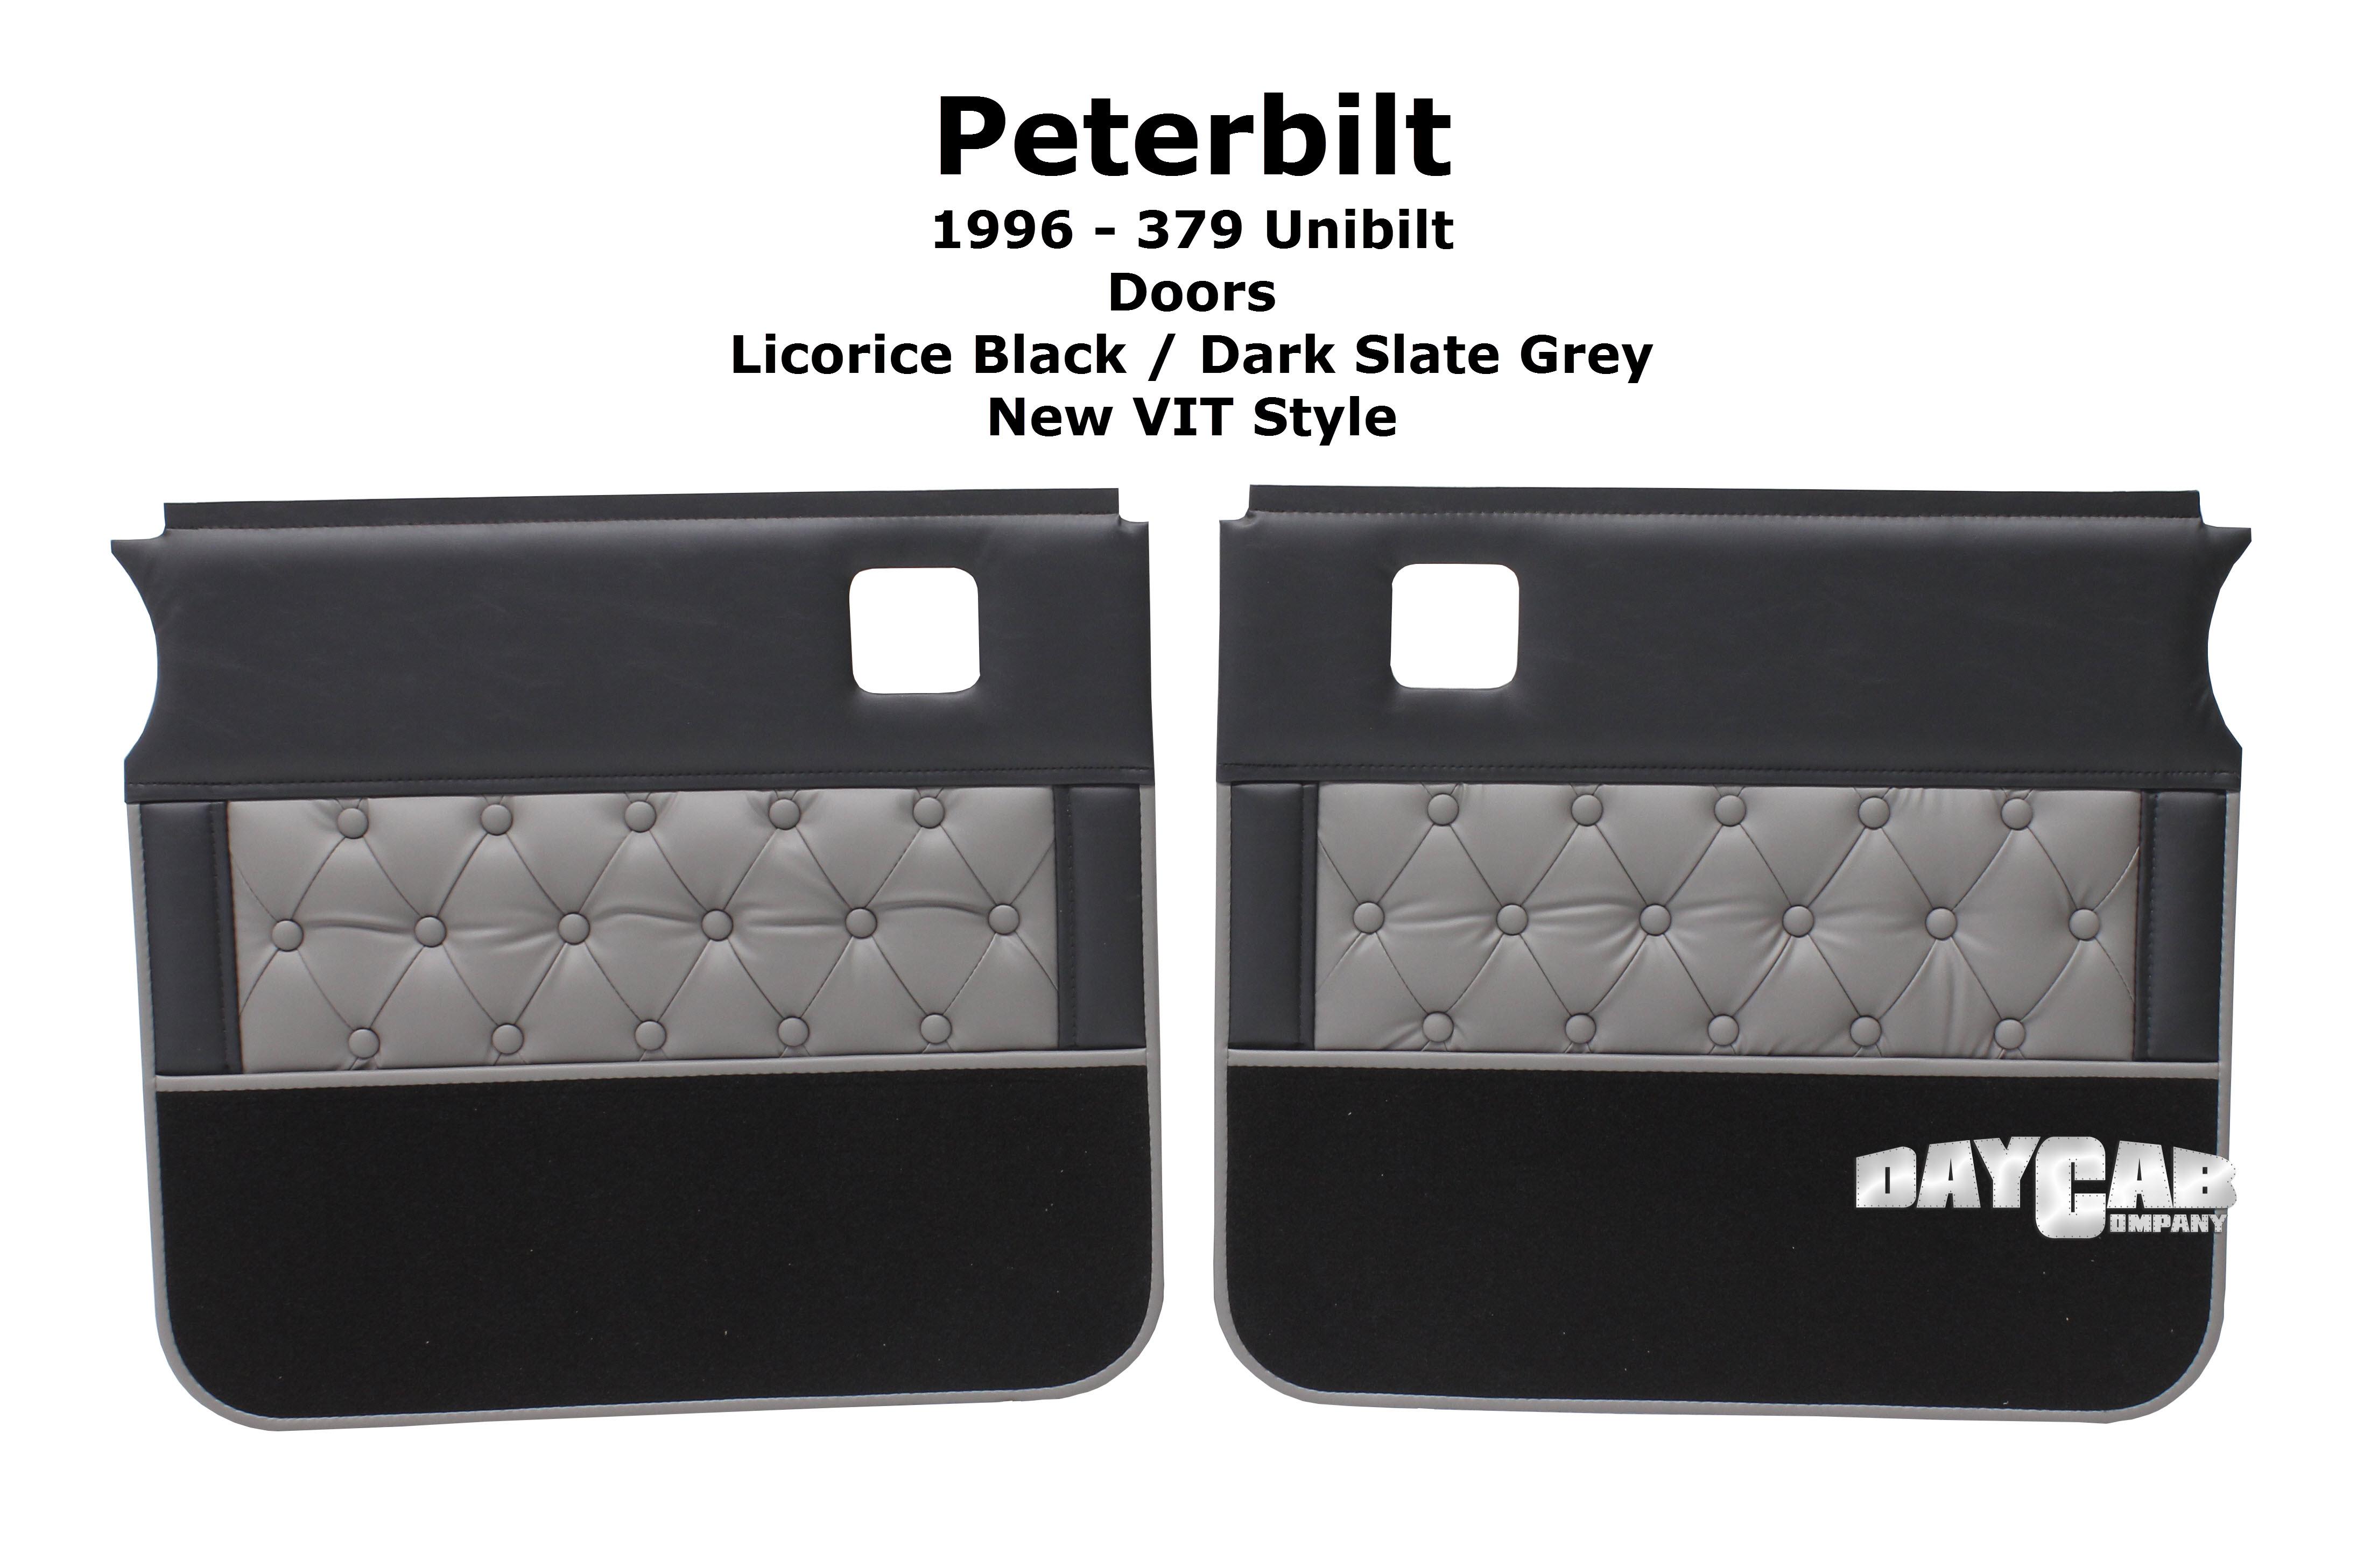 Peterbilt 1996 379 Unibilt Doors